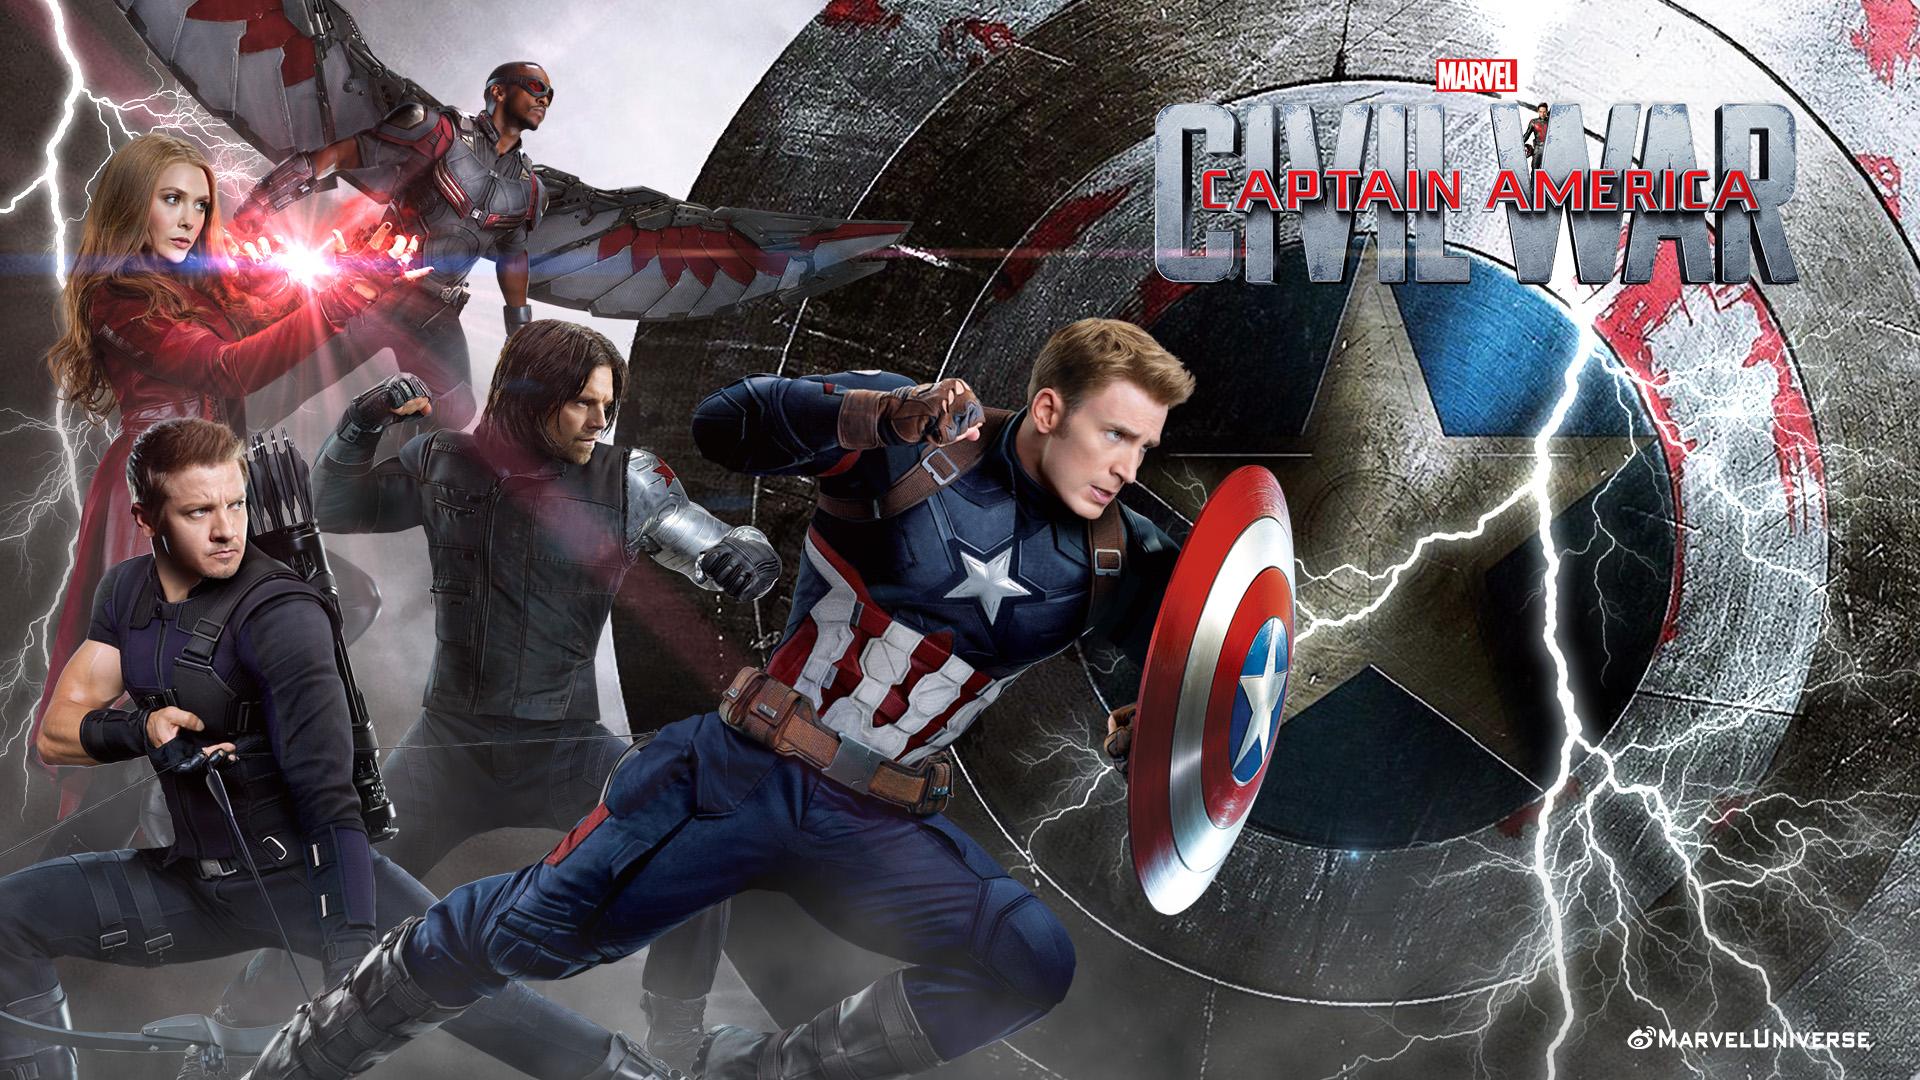 MOVIE TRAILERS  images Captain America Civil War Fanart HD 1920x1080